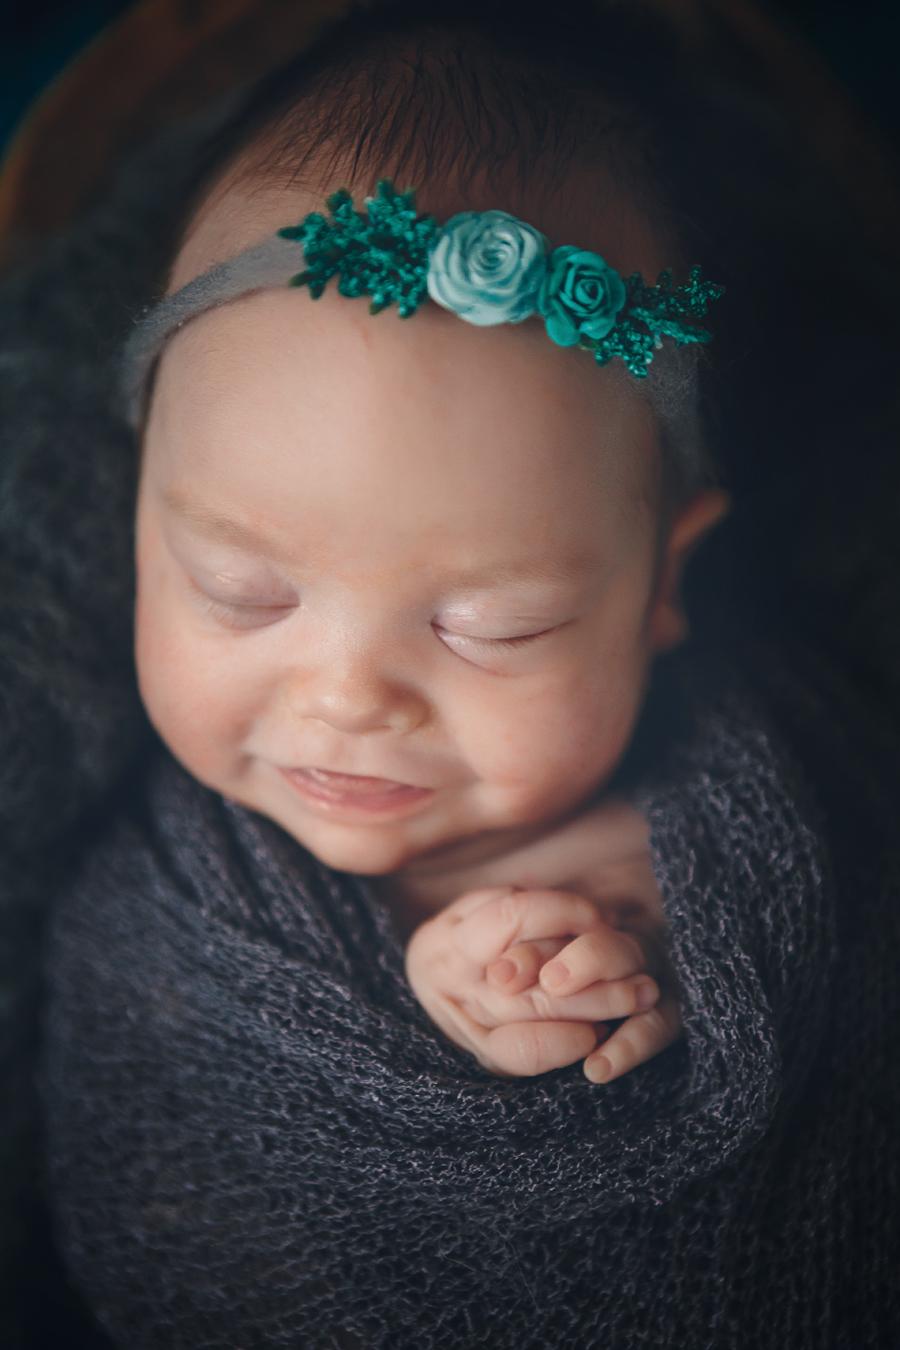 Artistic-Newborn-Photography05.jpg